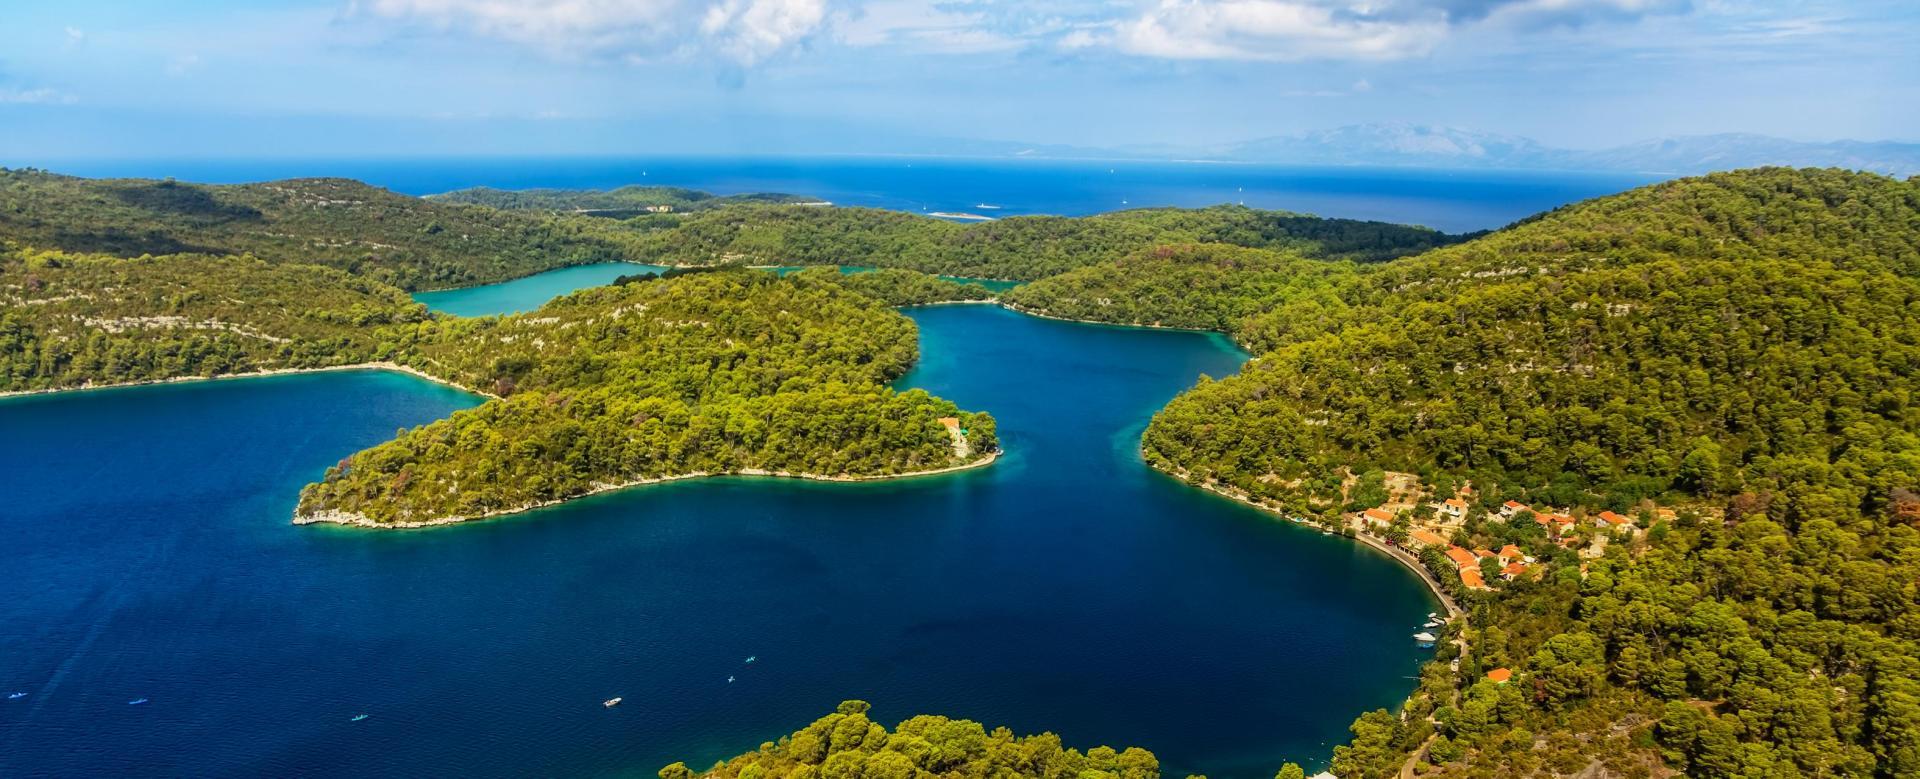 Voyage à pied : Croatie : Dubrovnik, korcula et mljet